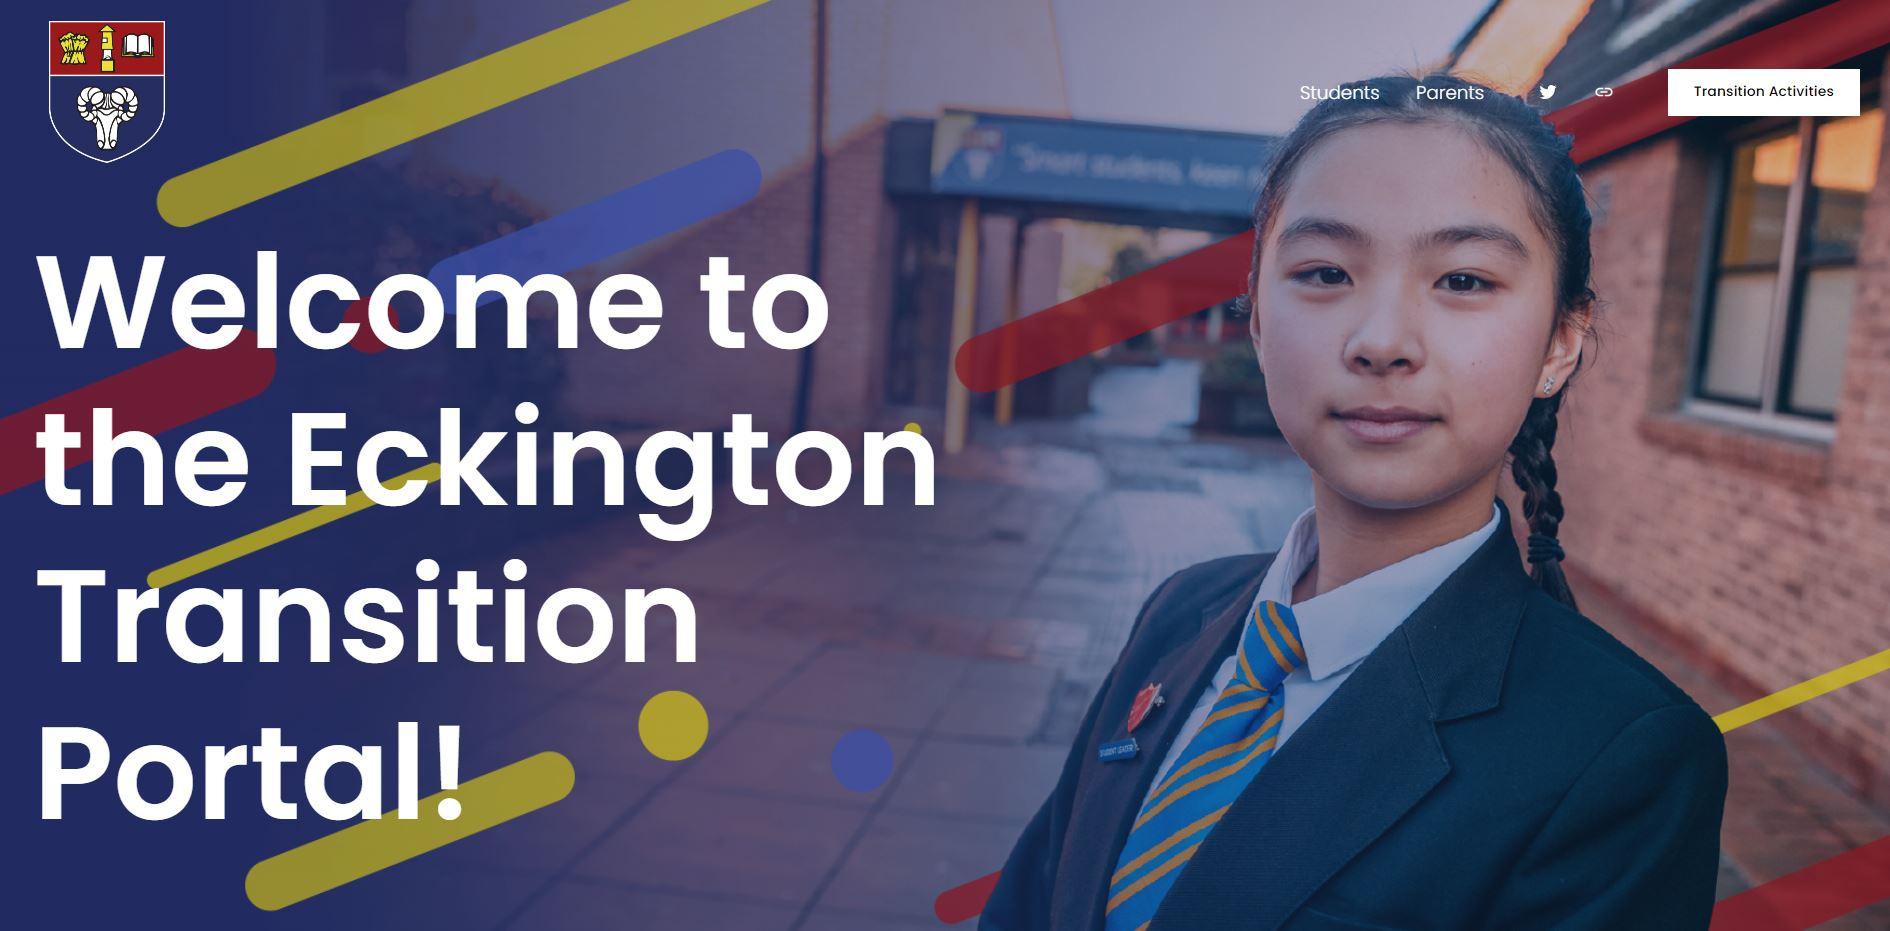 Look no further than Eckington School!